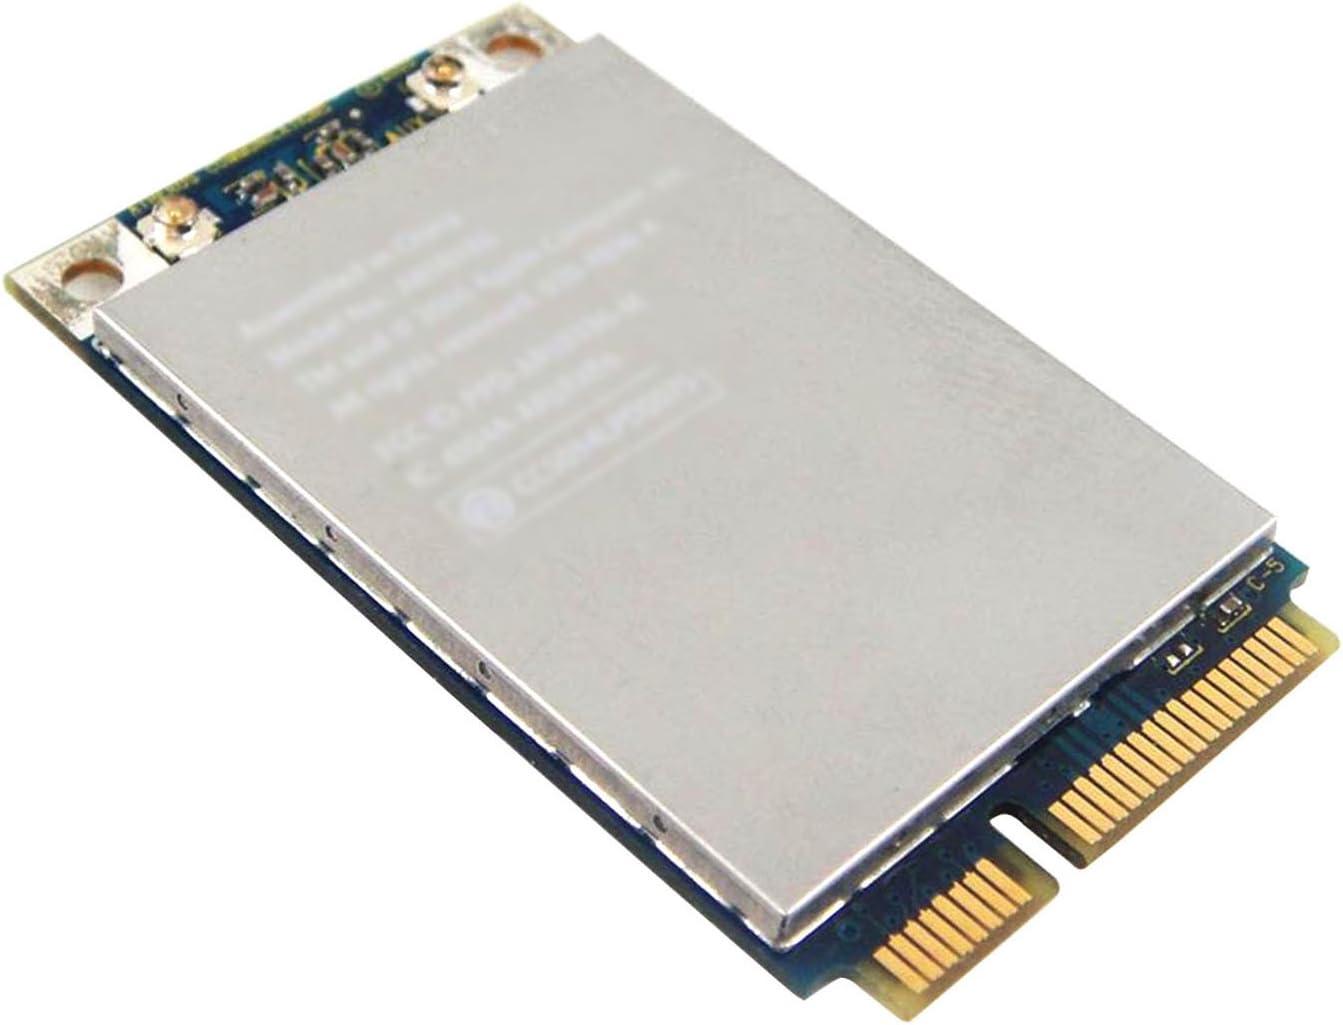 Qualcomm Atheros AR9280 AR5BXB92 AR5009 Mini PCI-Express PCIe Wireless WLAN Wifi Card for apple 825-7360-A 607-3758-A A1311 661-5423-A A1312